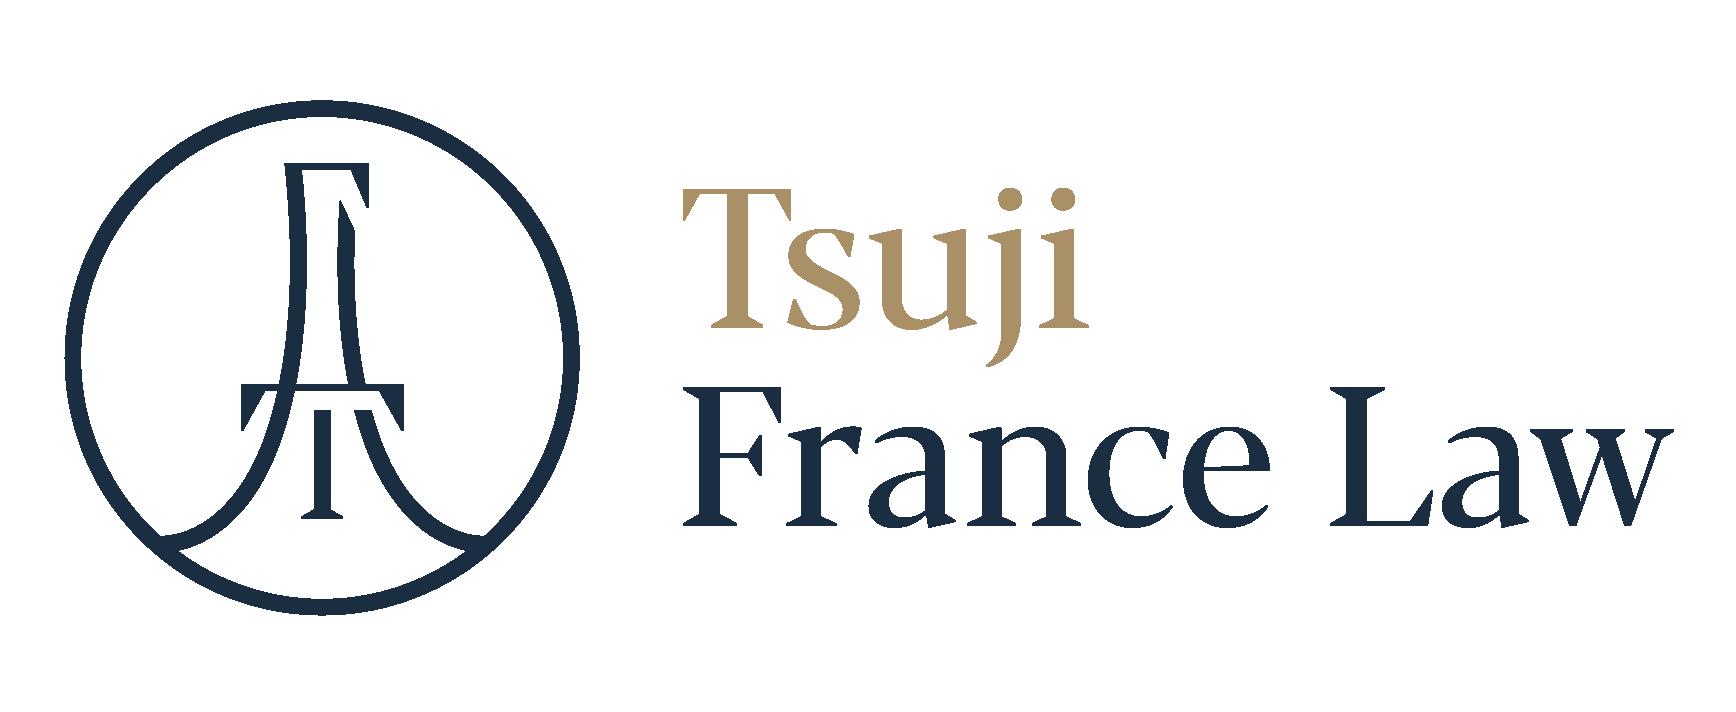 Tsuji France Law